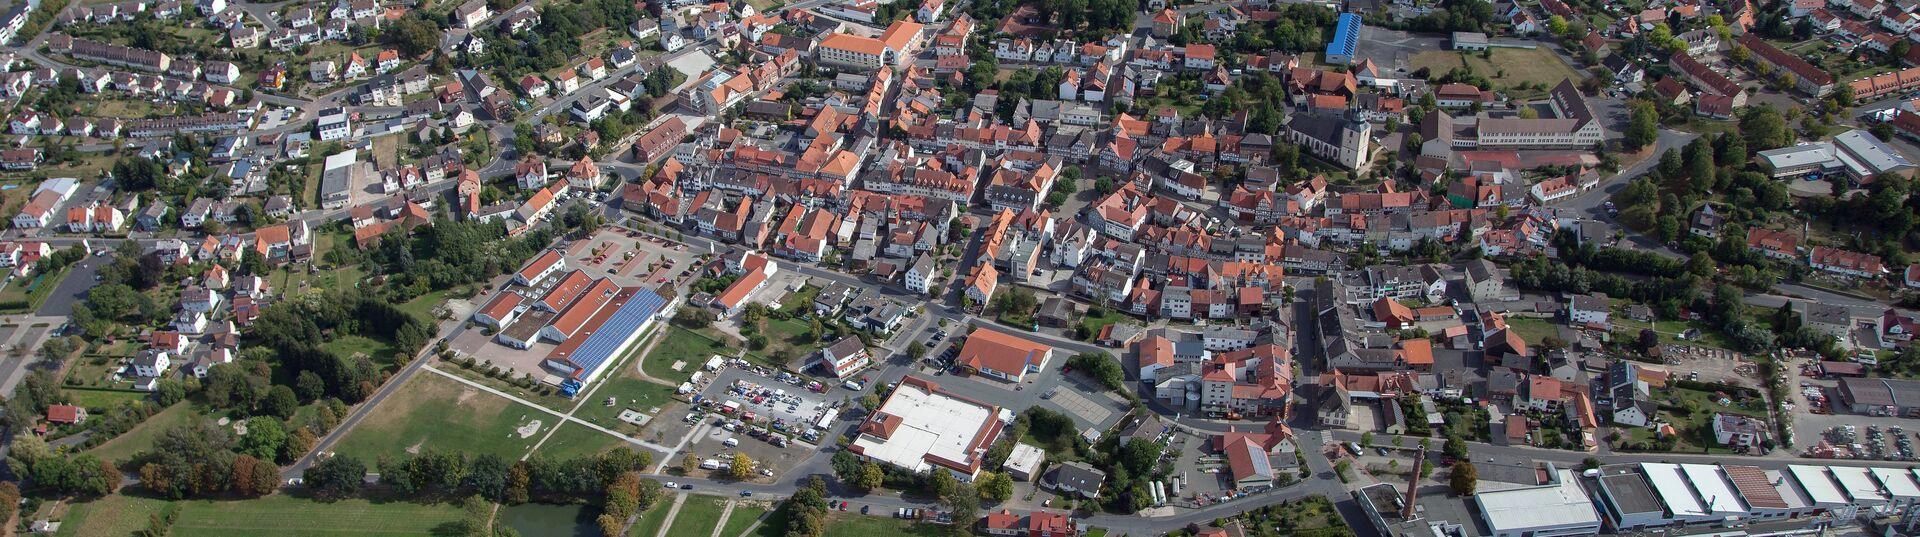 Panorama_Sontra_Innenstadt